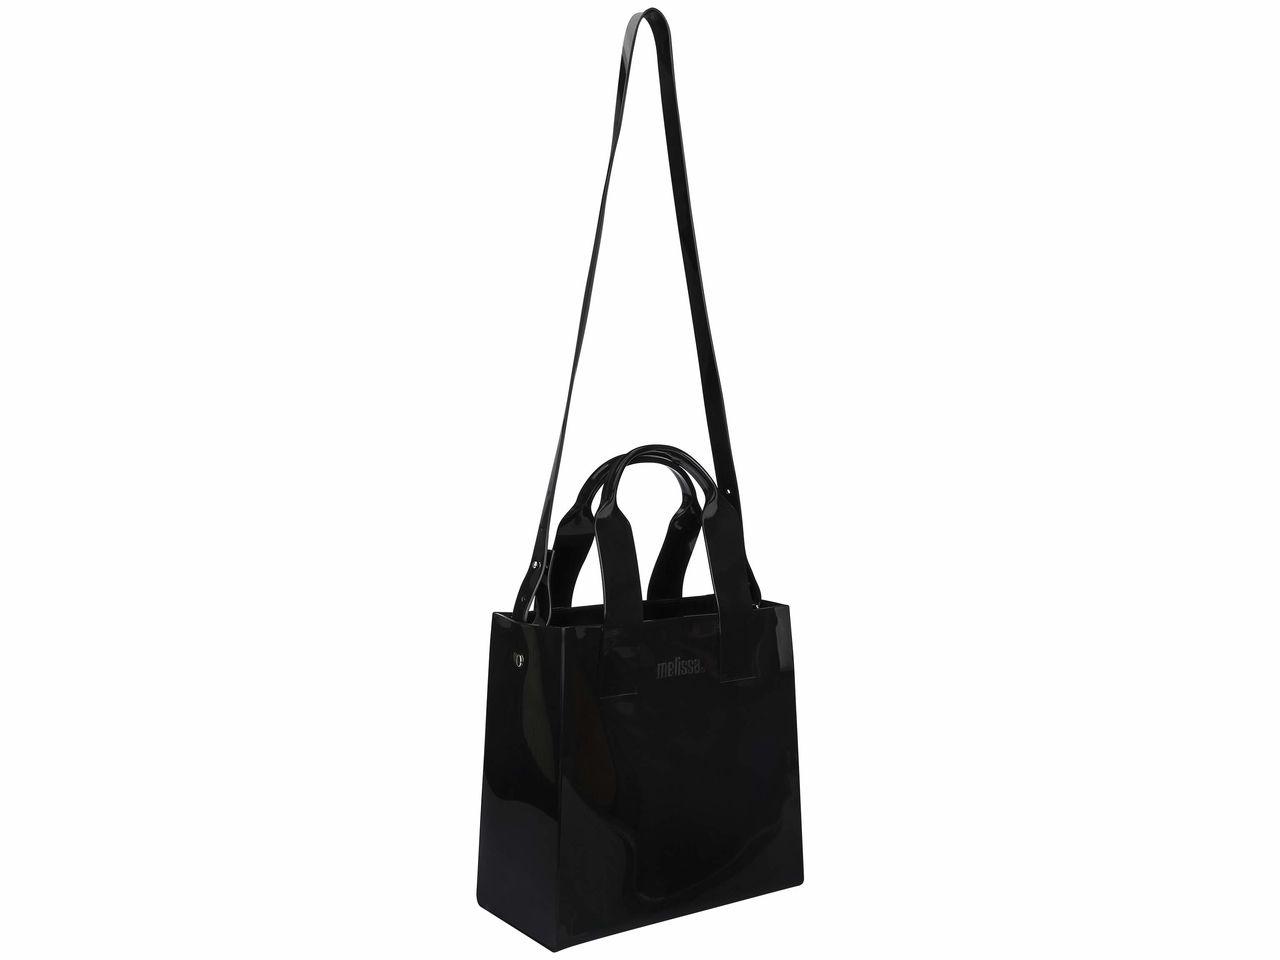 Bolsa Melissa ESSENTIAL TOTE BAG